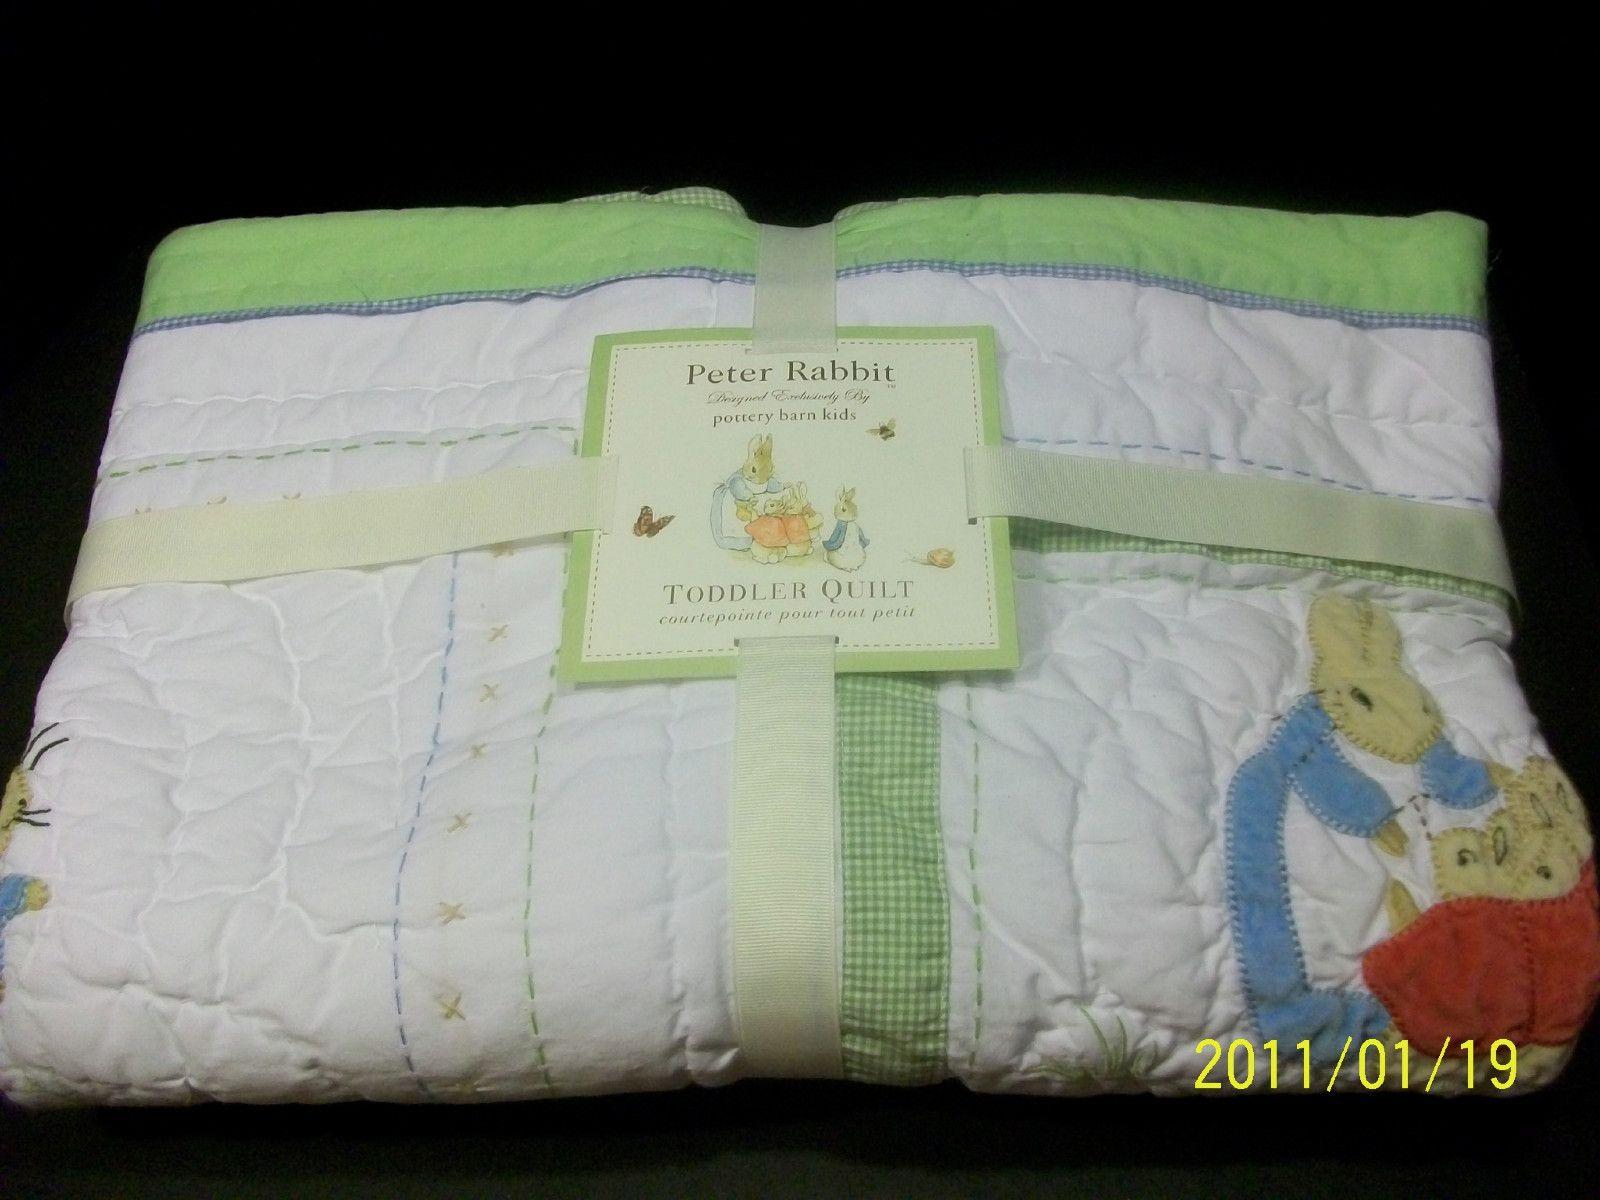 Pottery Barn Kid Peter Rabbit Crib Quilt Beatrix Potter